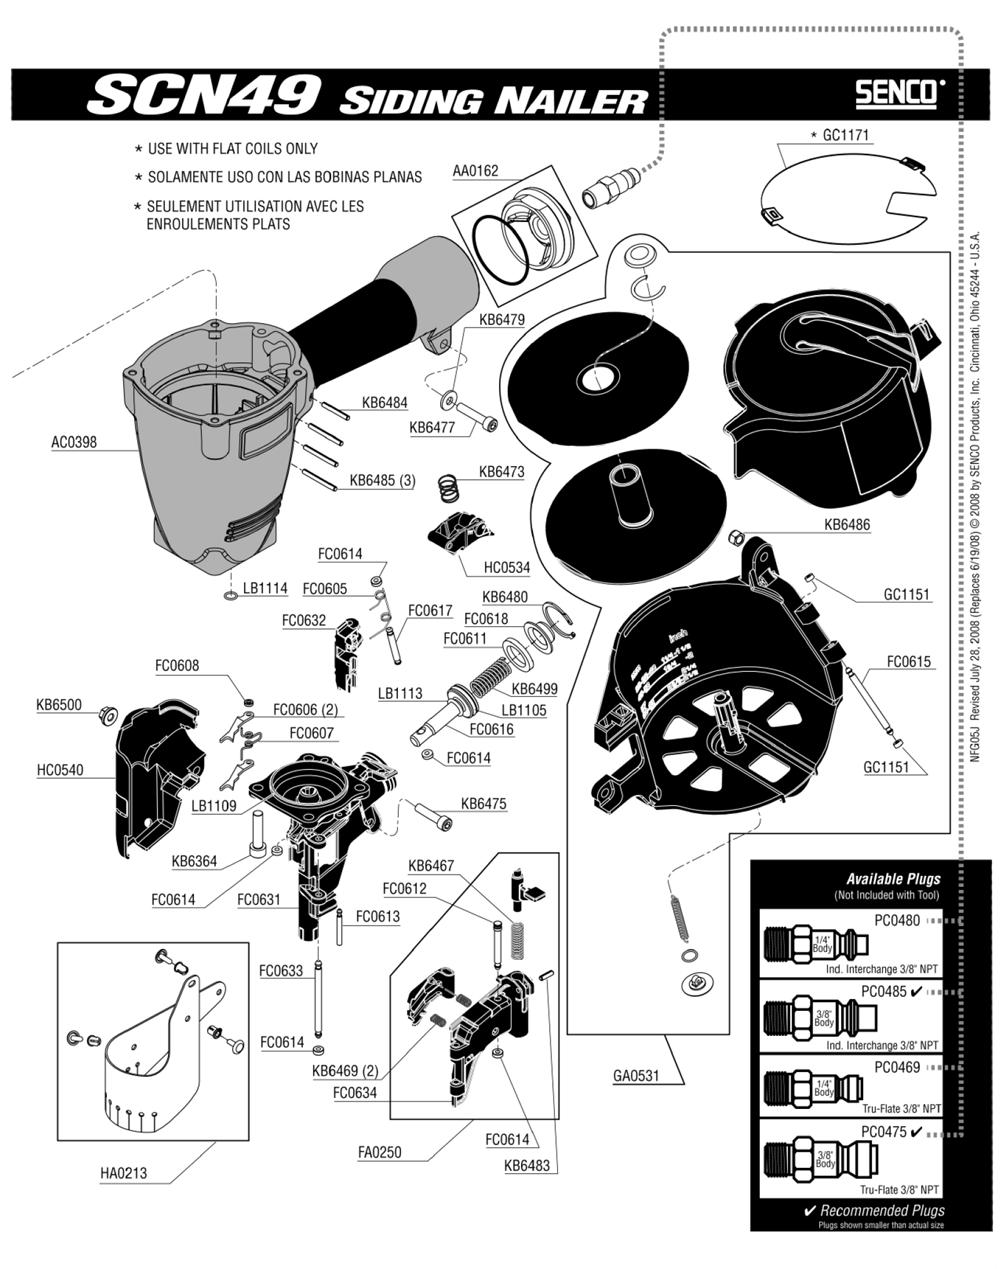 5J0001N-senco-PB-1Break Down